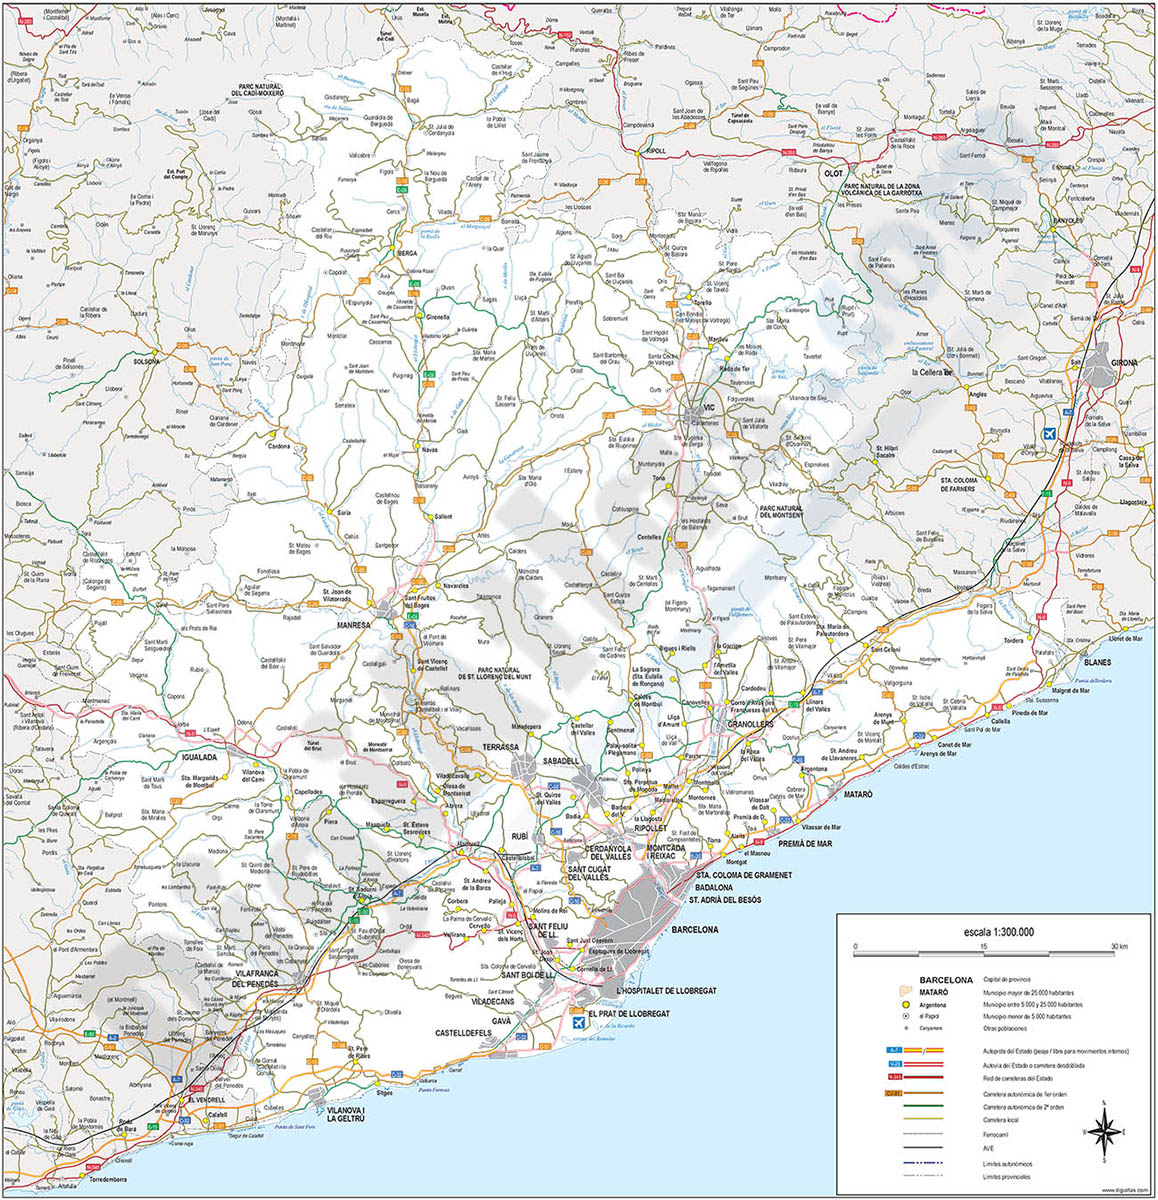 Barcelona - Map of province